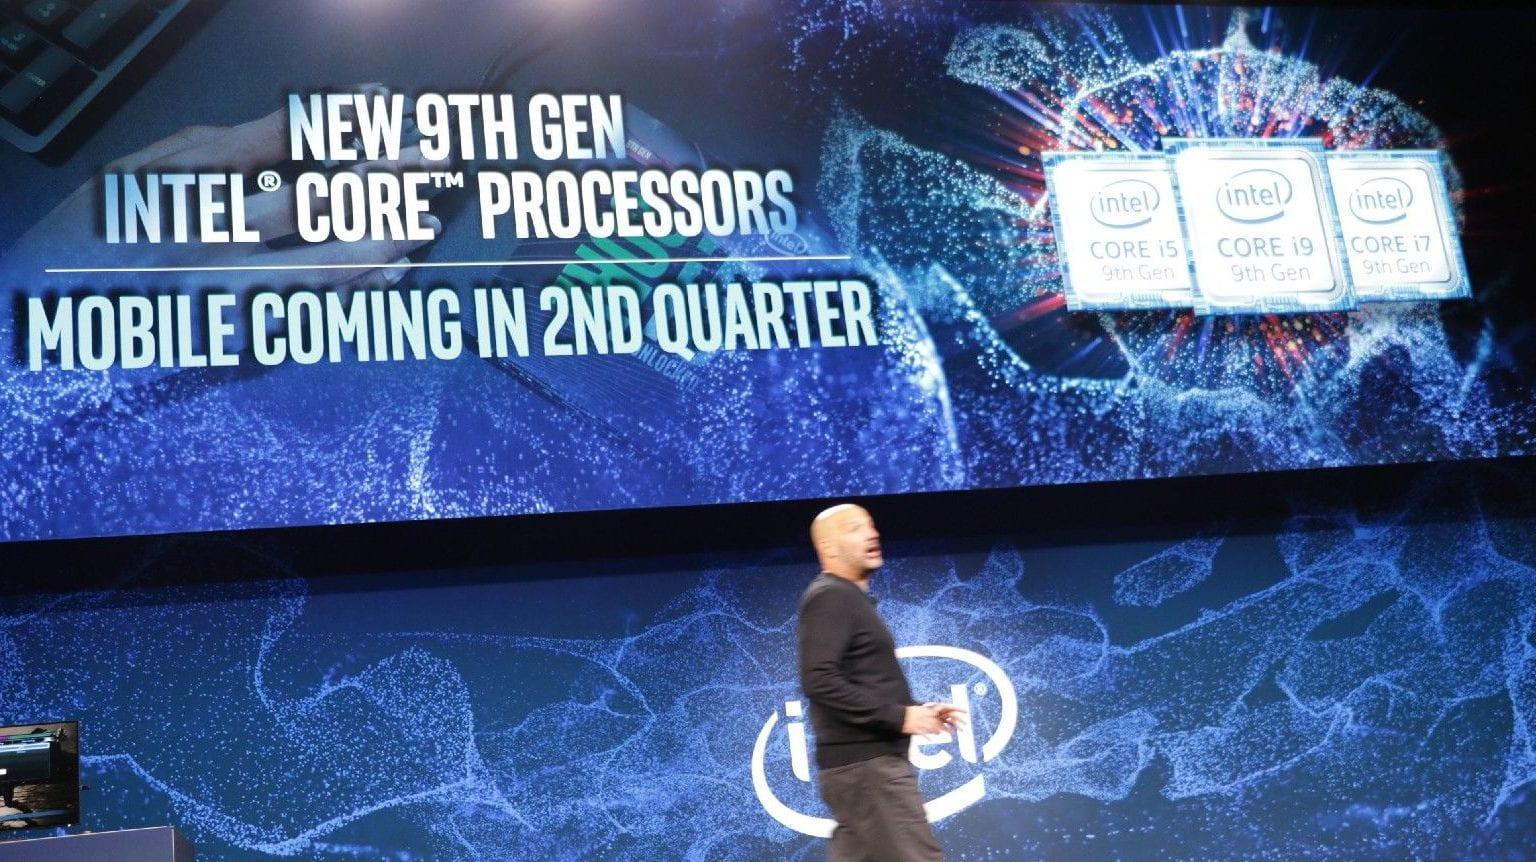 Intel announces six new ninth-generation Core processors